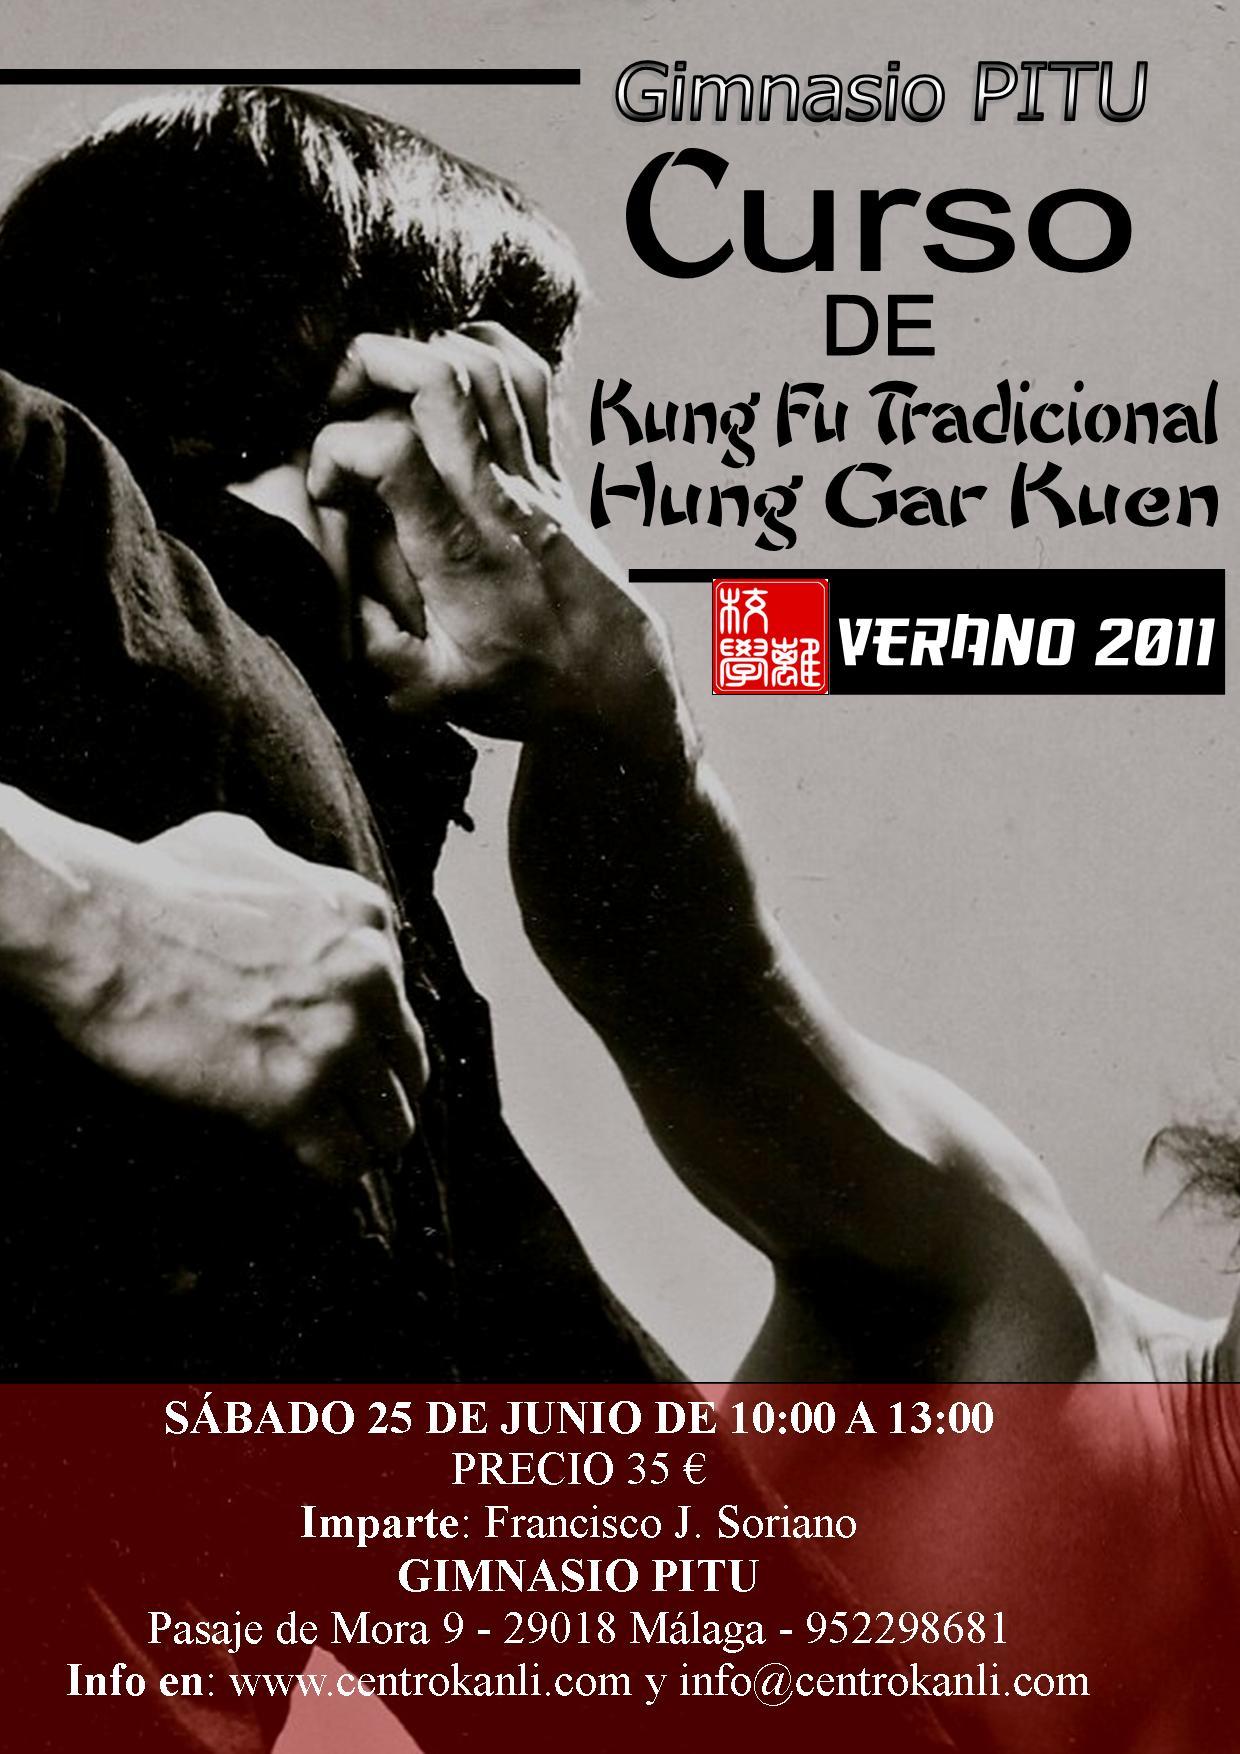 cursohungar20112